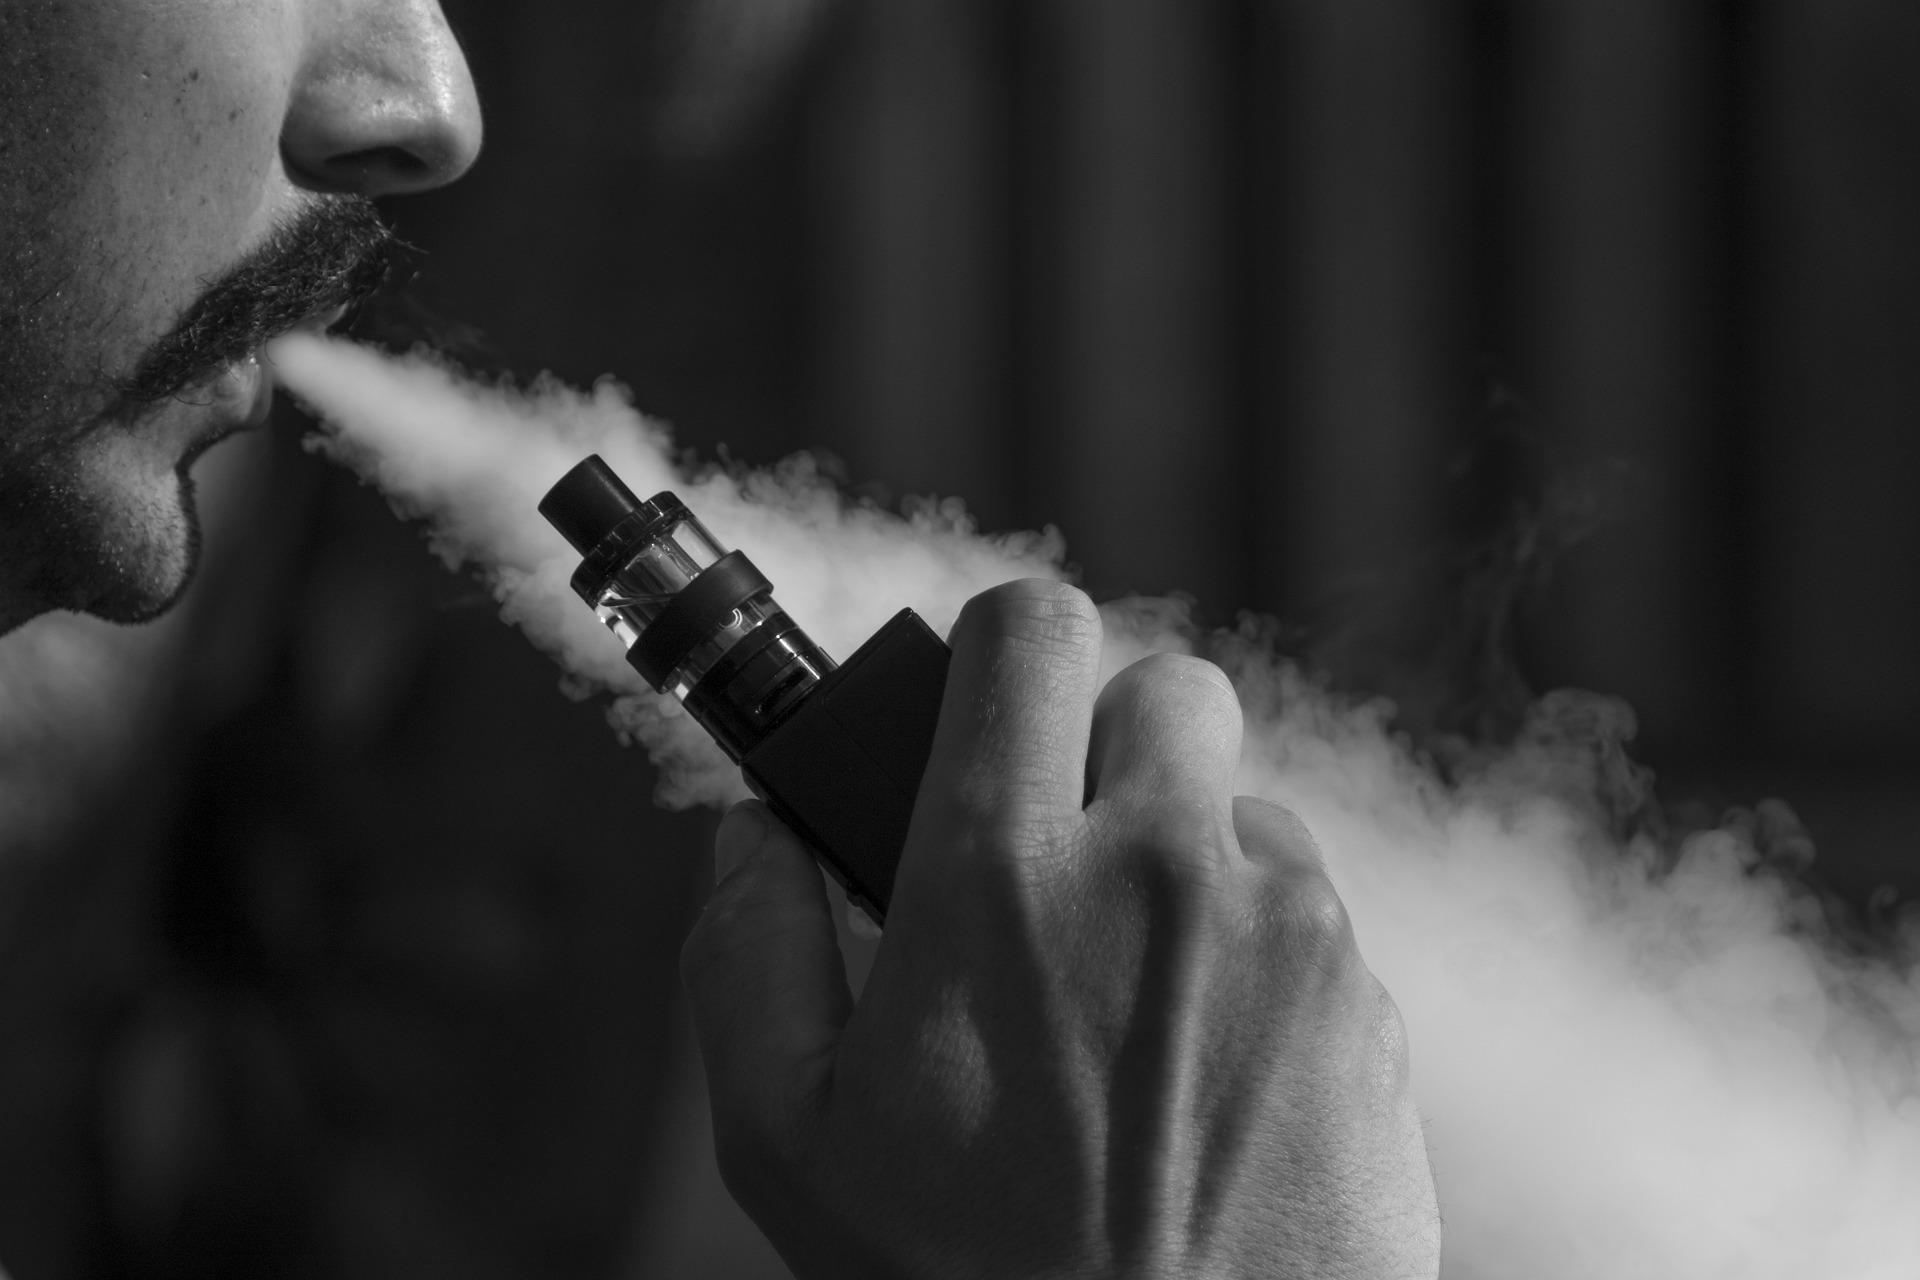 man-vaping-nicotine-salt